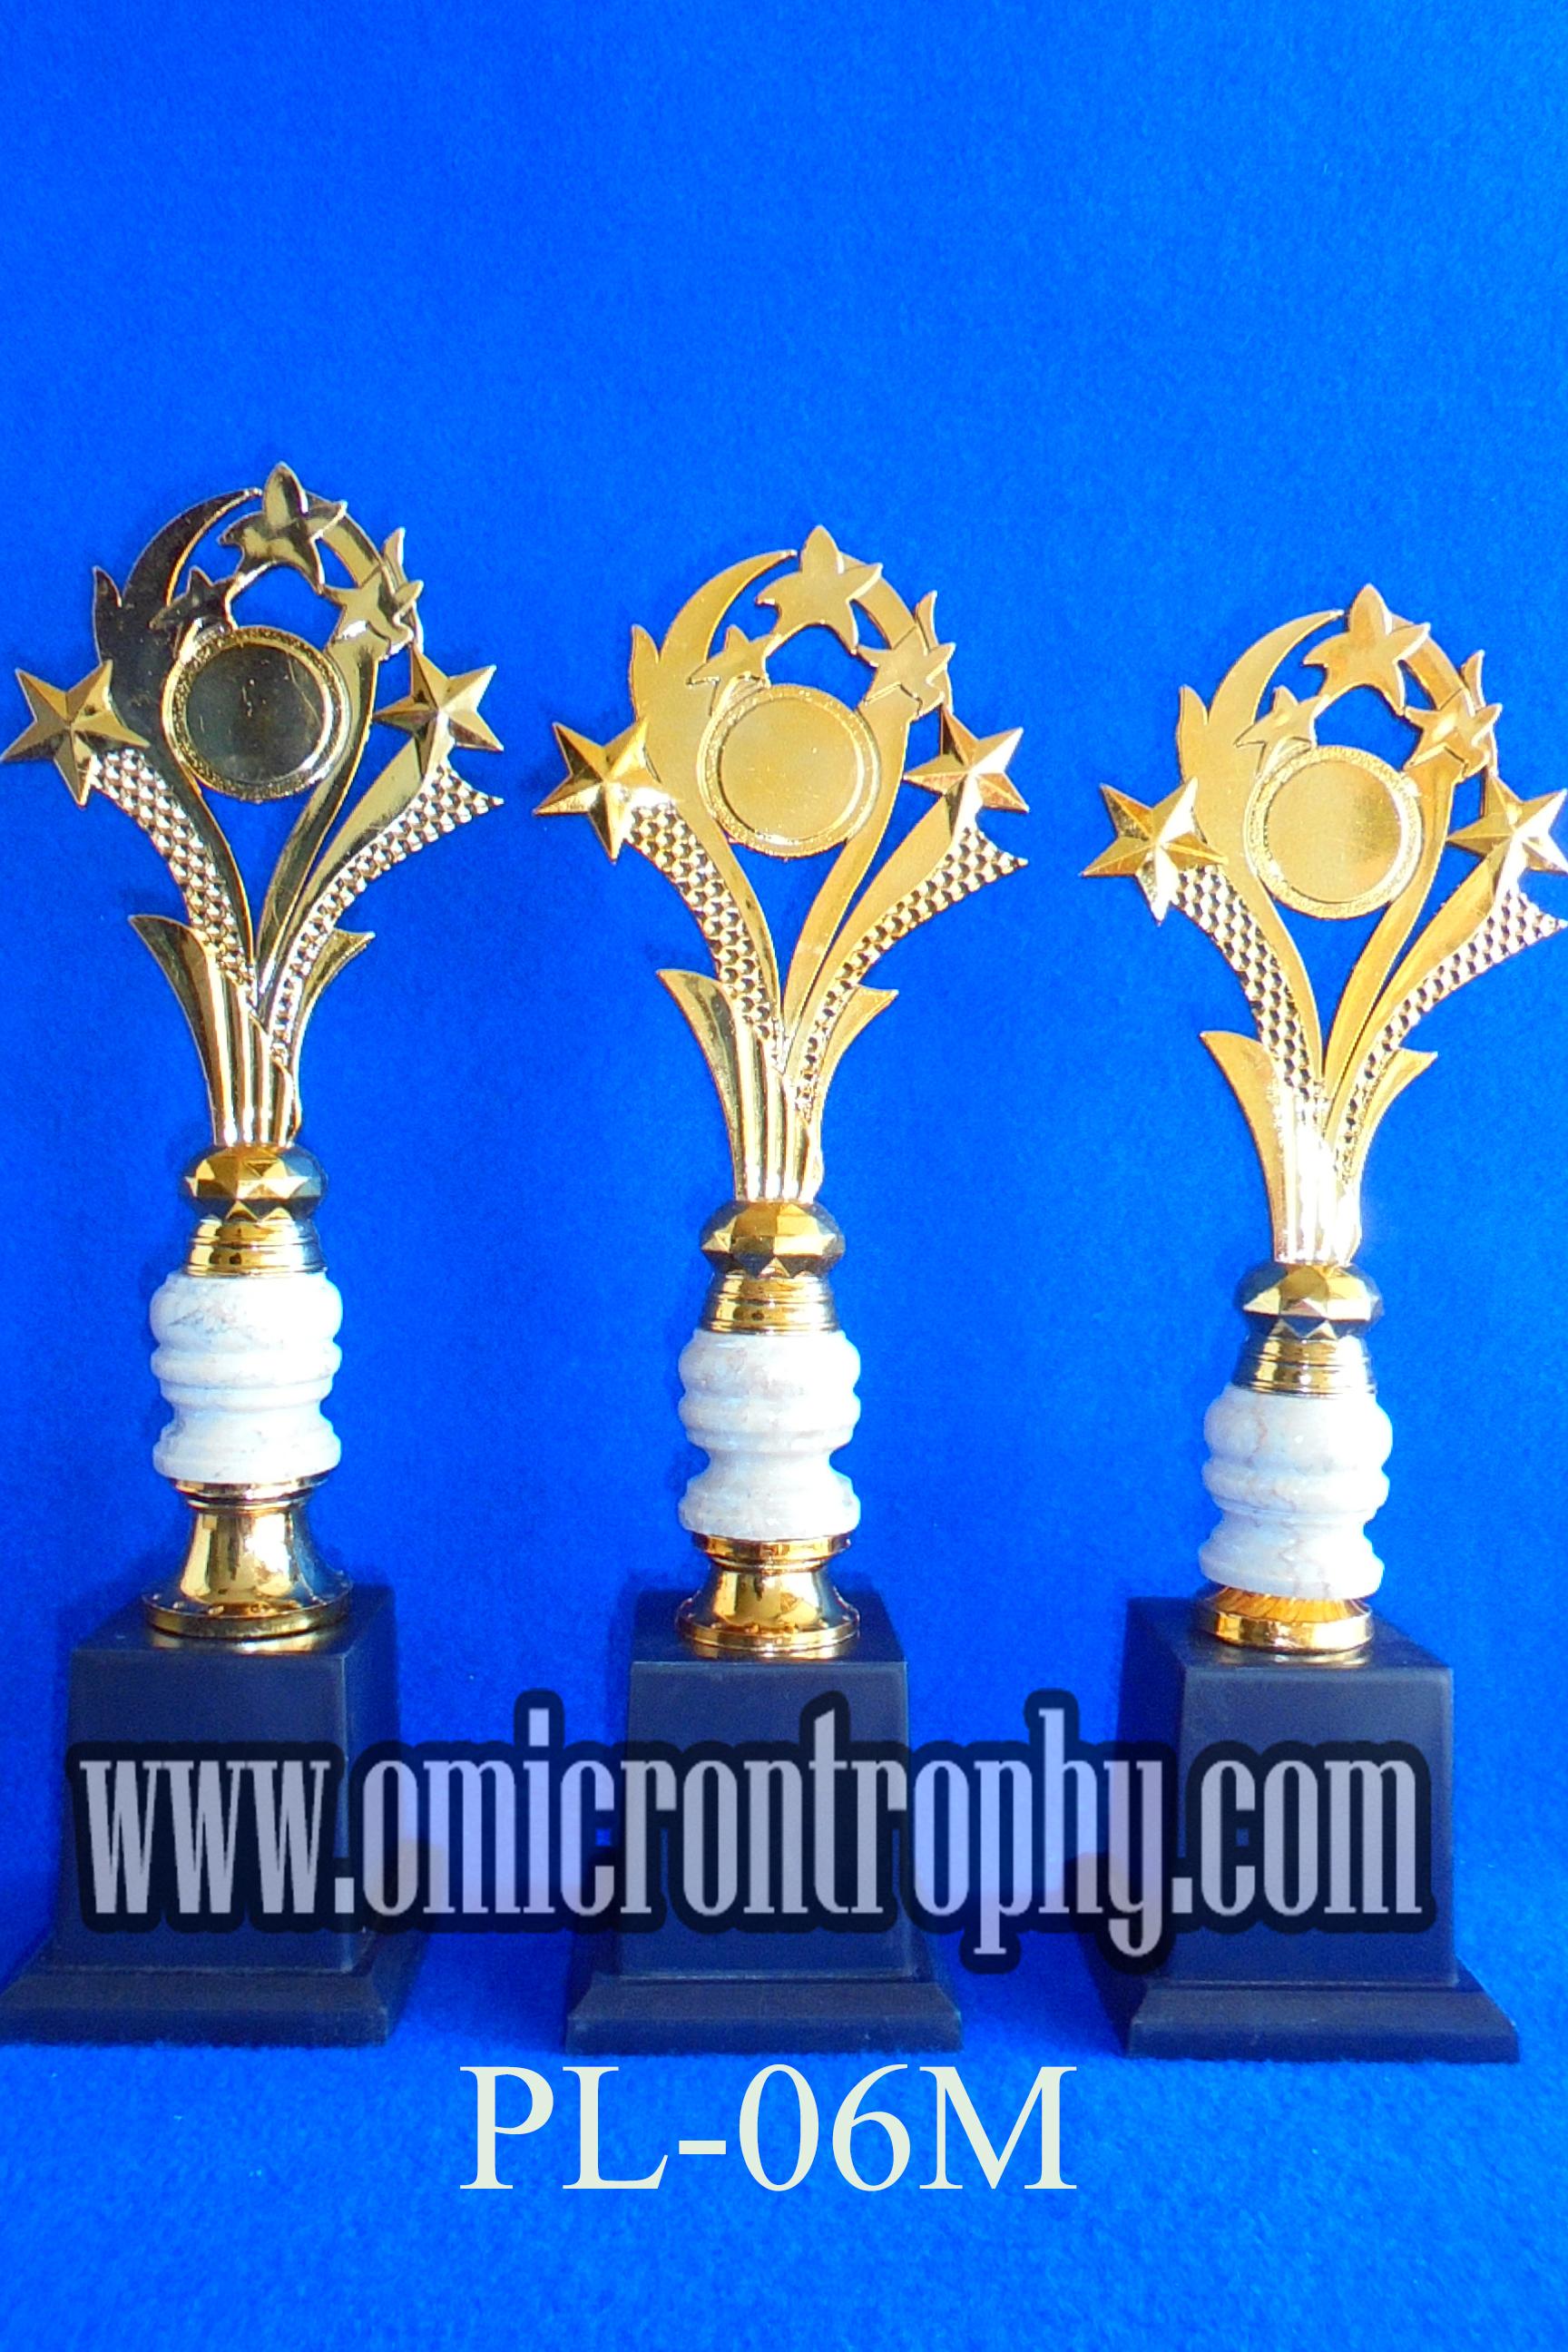 Agen Jual Piala Trophy Marmer Murah-PL-06M